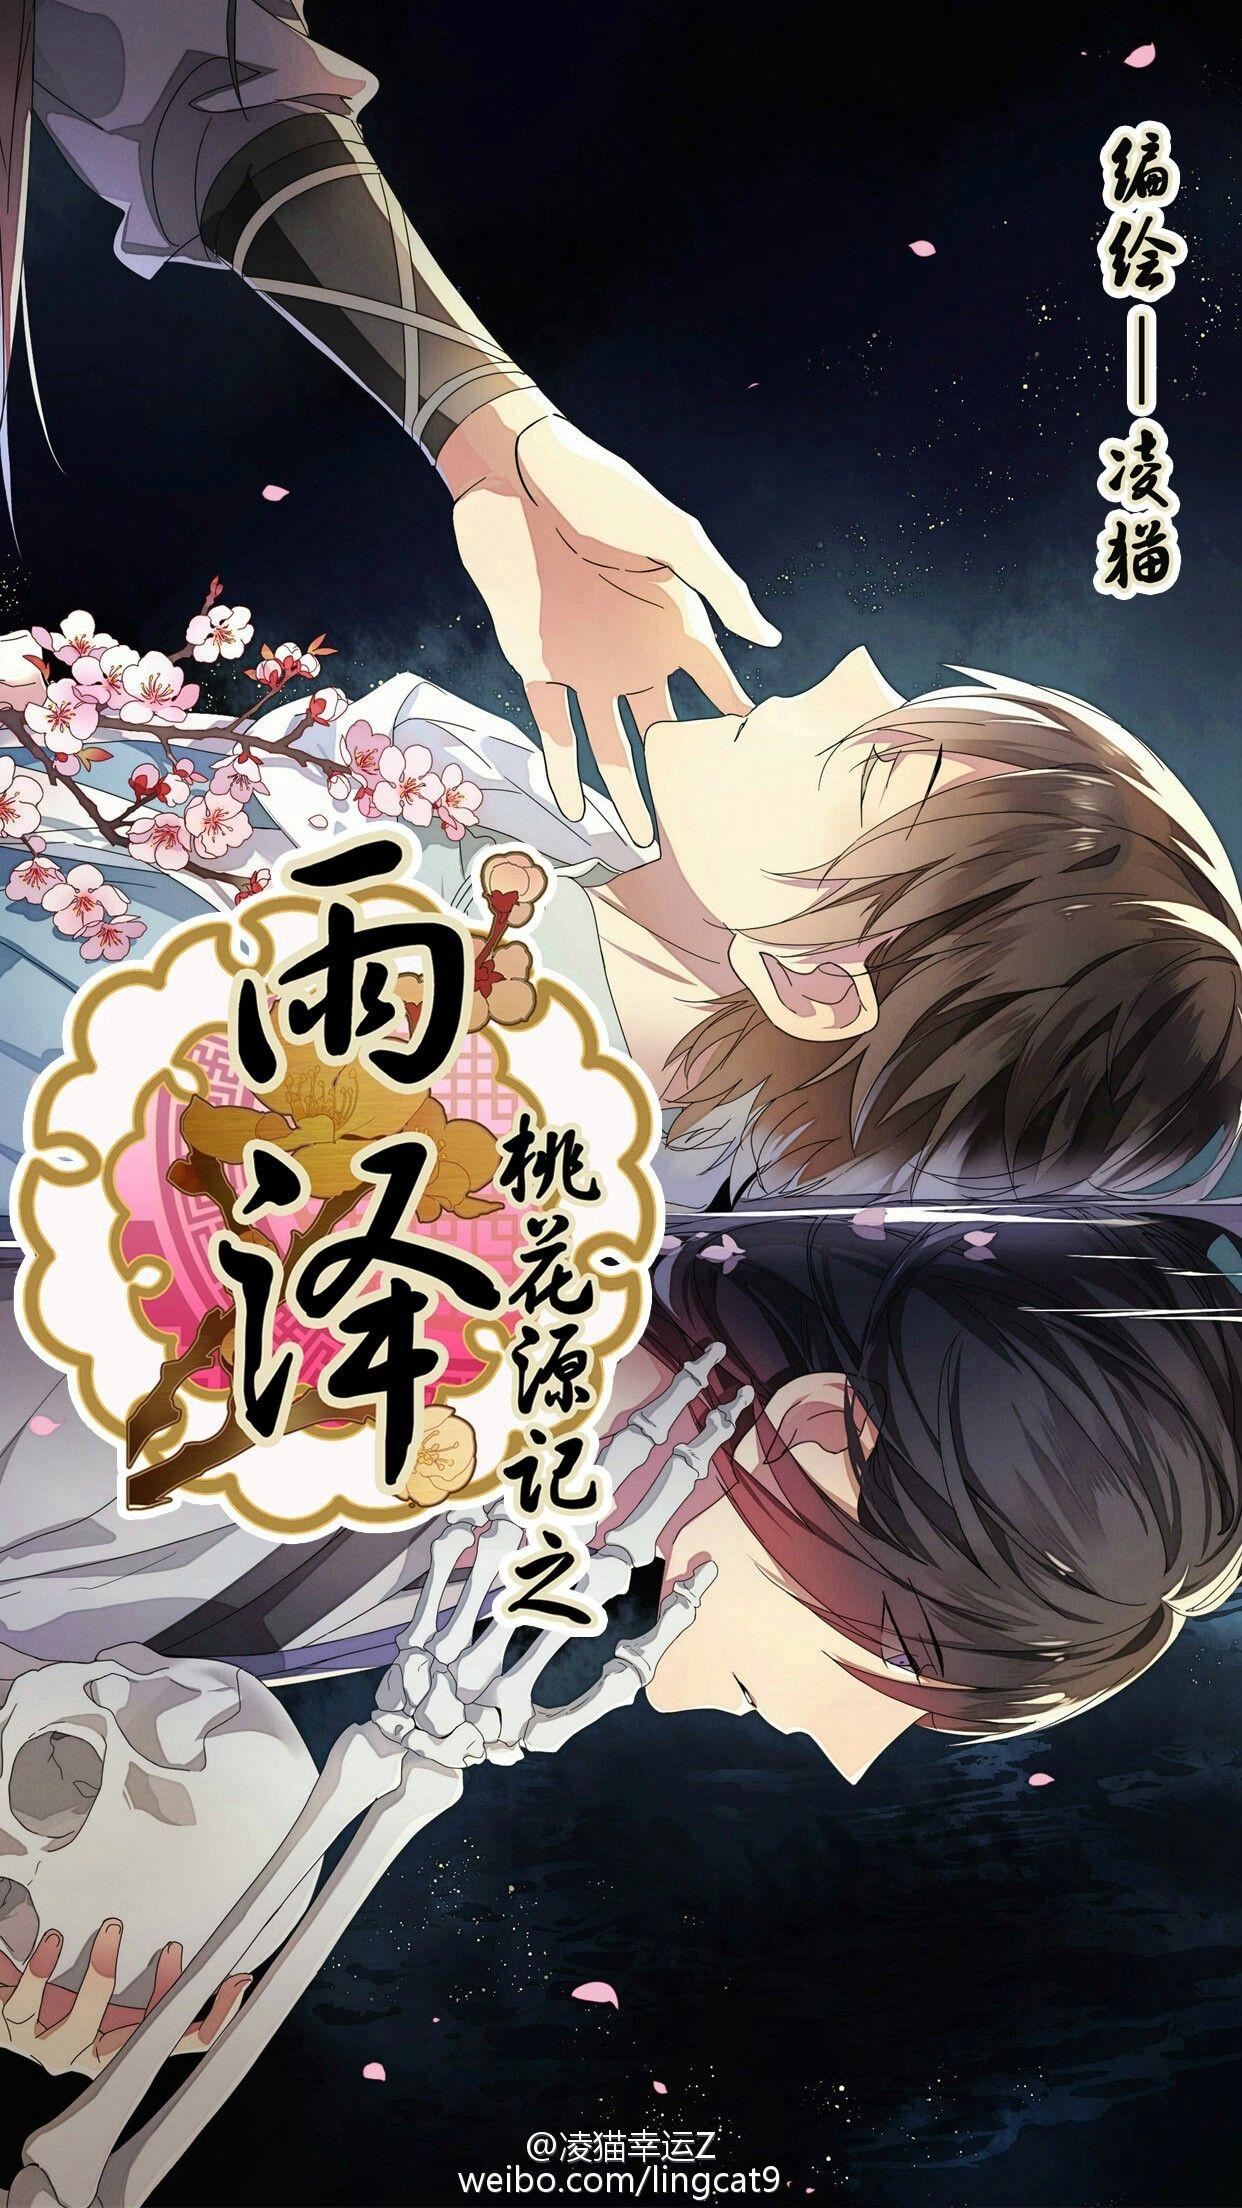 Pin by Дзёшико on манга Anime, Poster, Manga